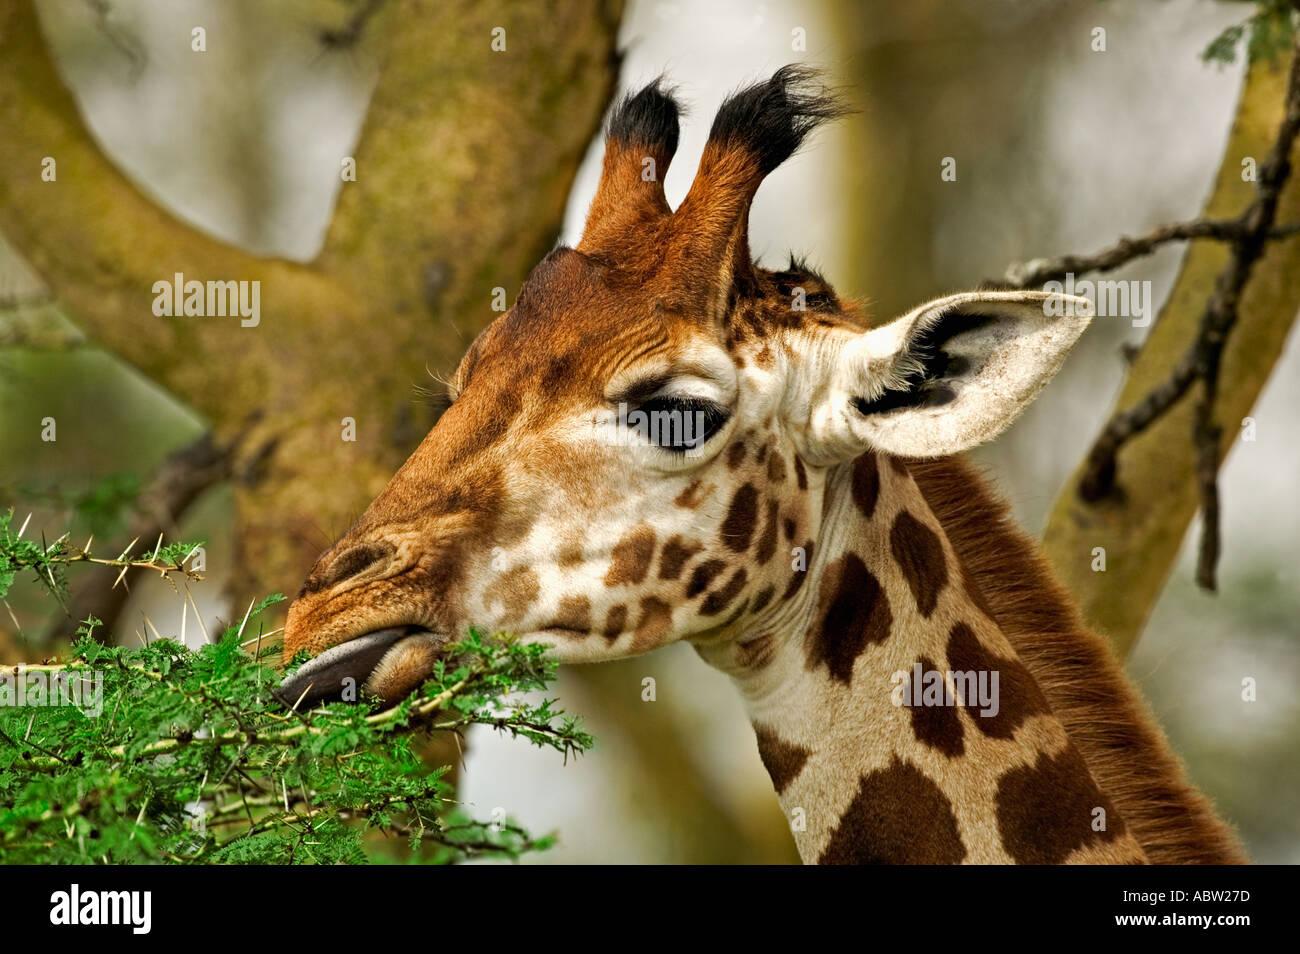 Rothschild Giraffe Giraffa camelopardalis rothschildi One of 9 subspecies of giraffe Lake Nakuru Park Kenya East Africa - Stock Image